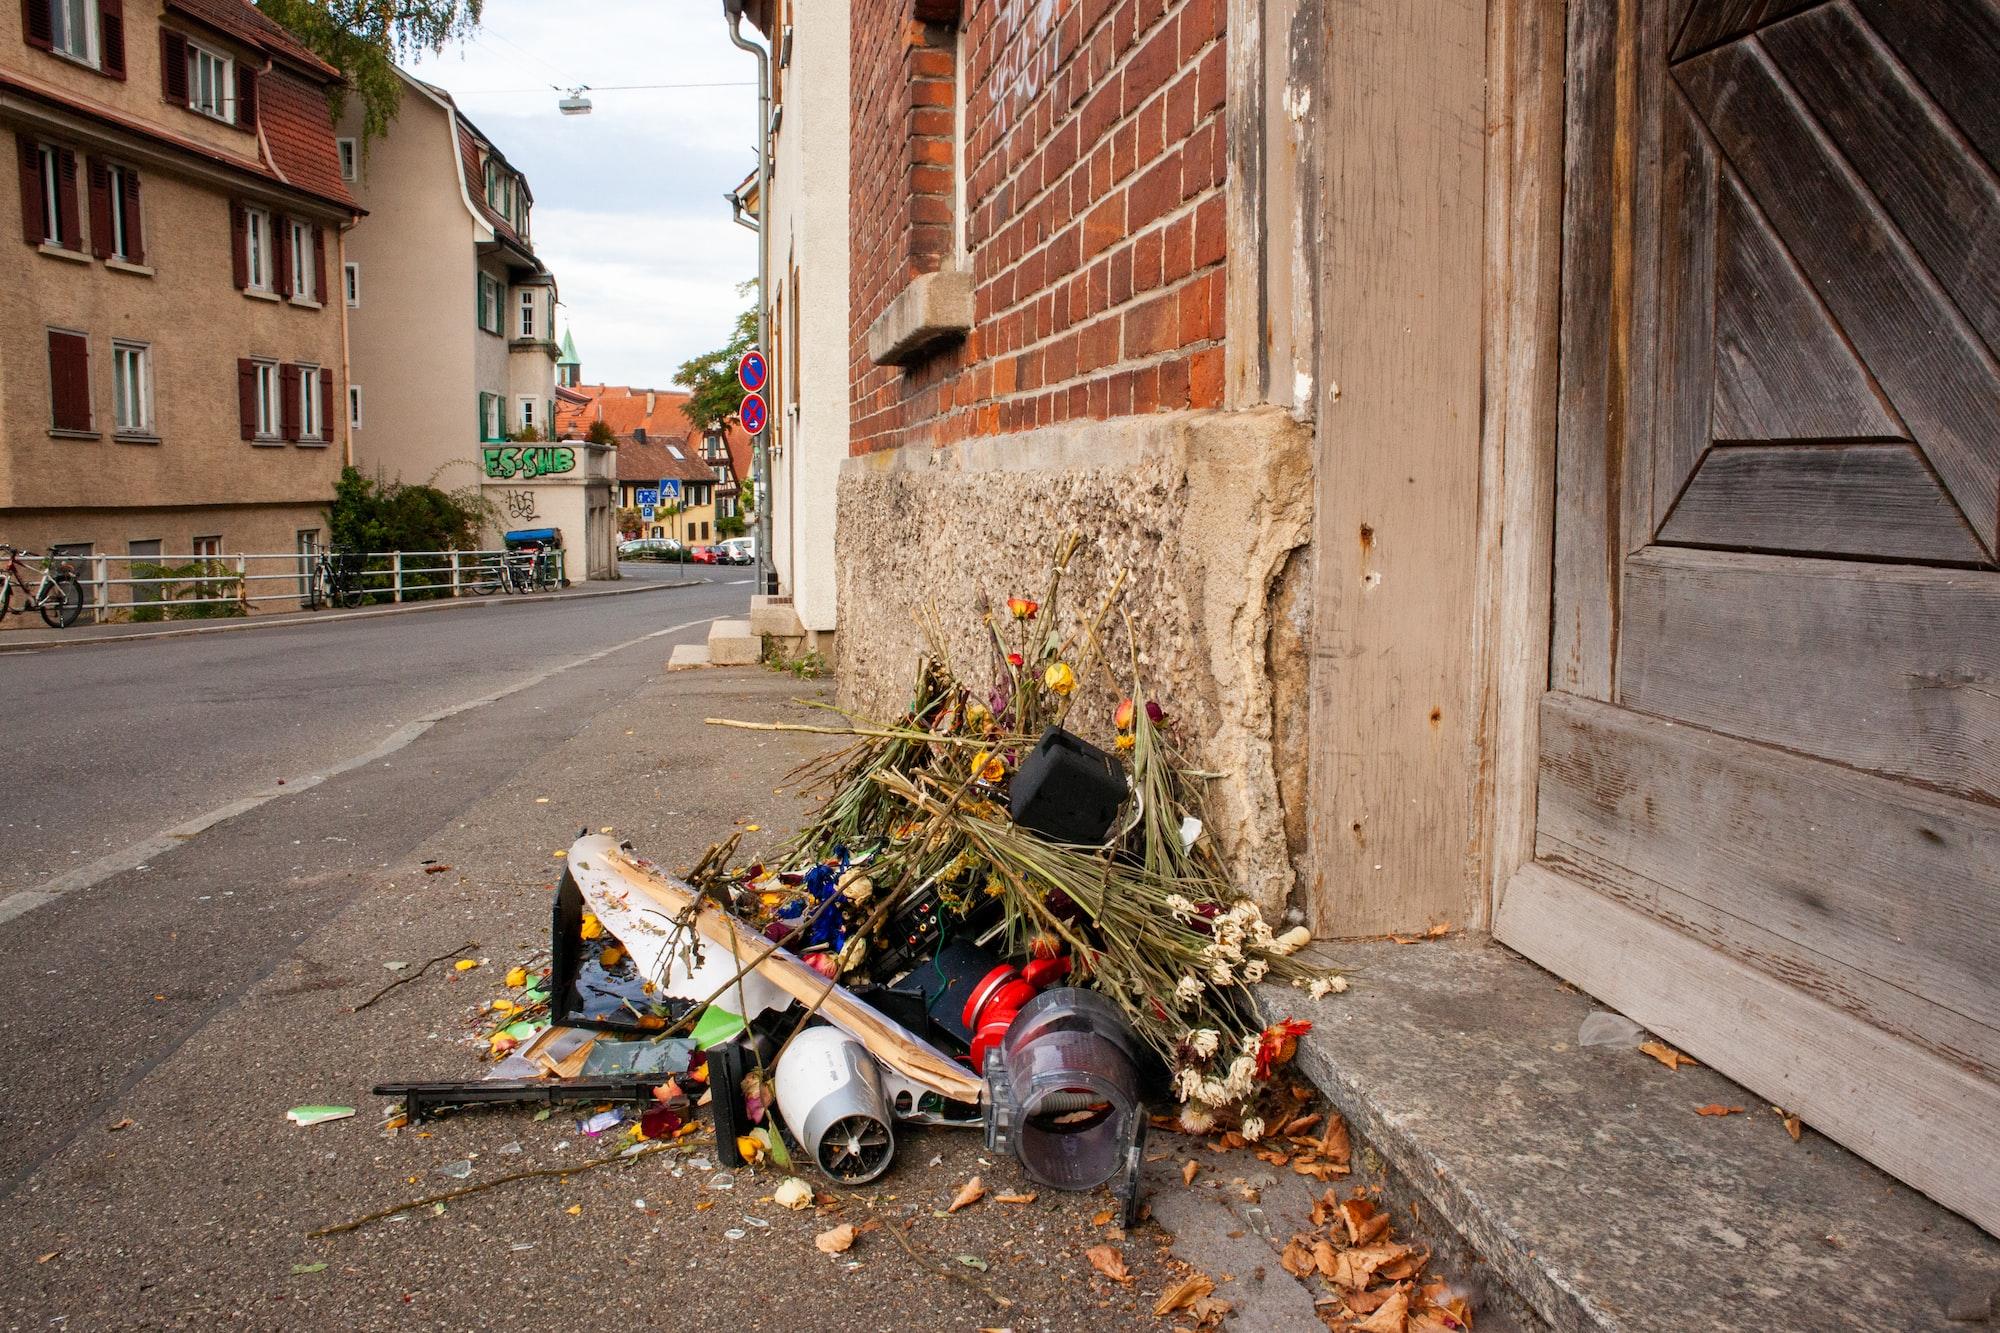 garbage heap, street, street panorama, wild garbage, pollution, dirt, street scene, garbage, waste, recycle